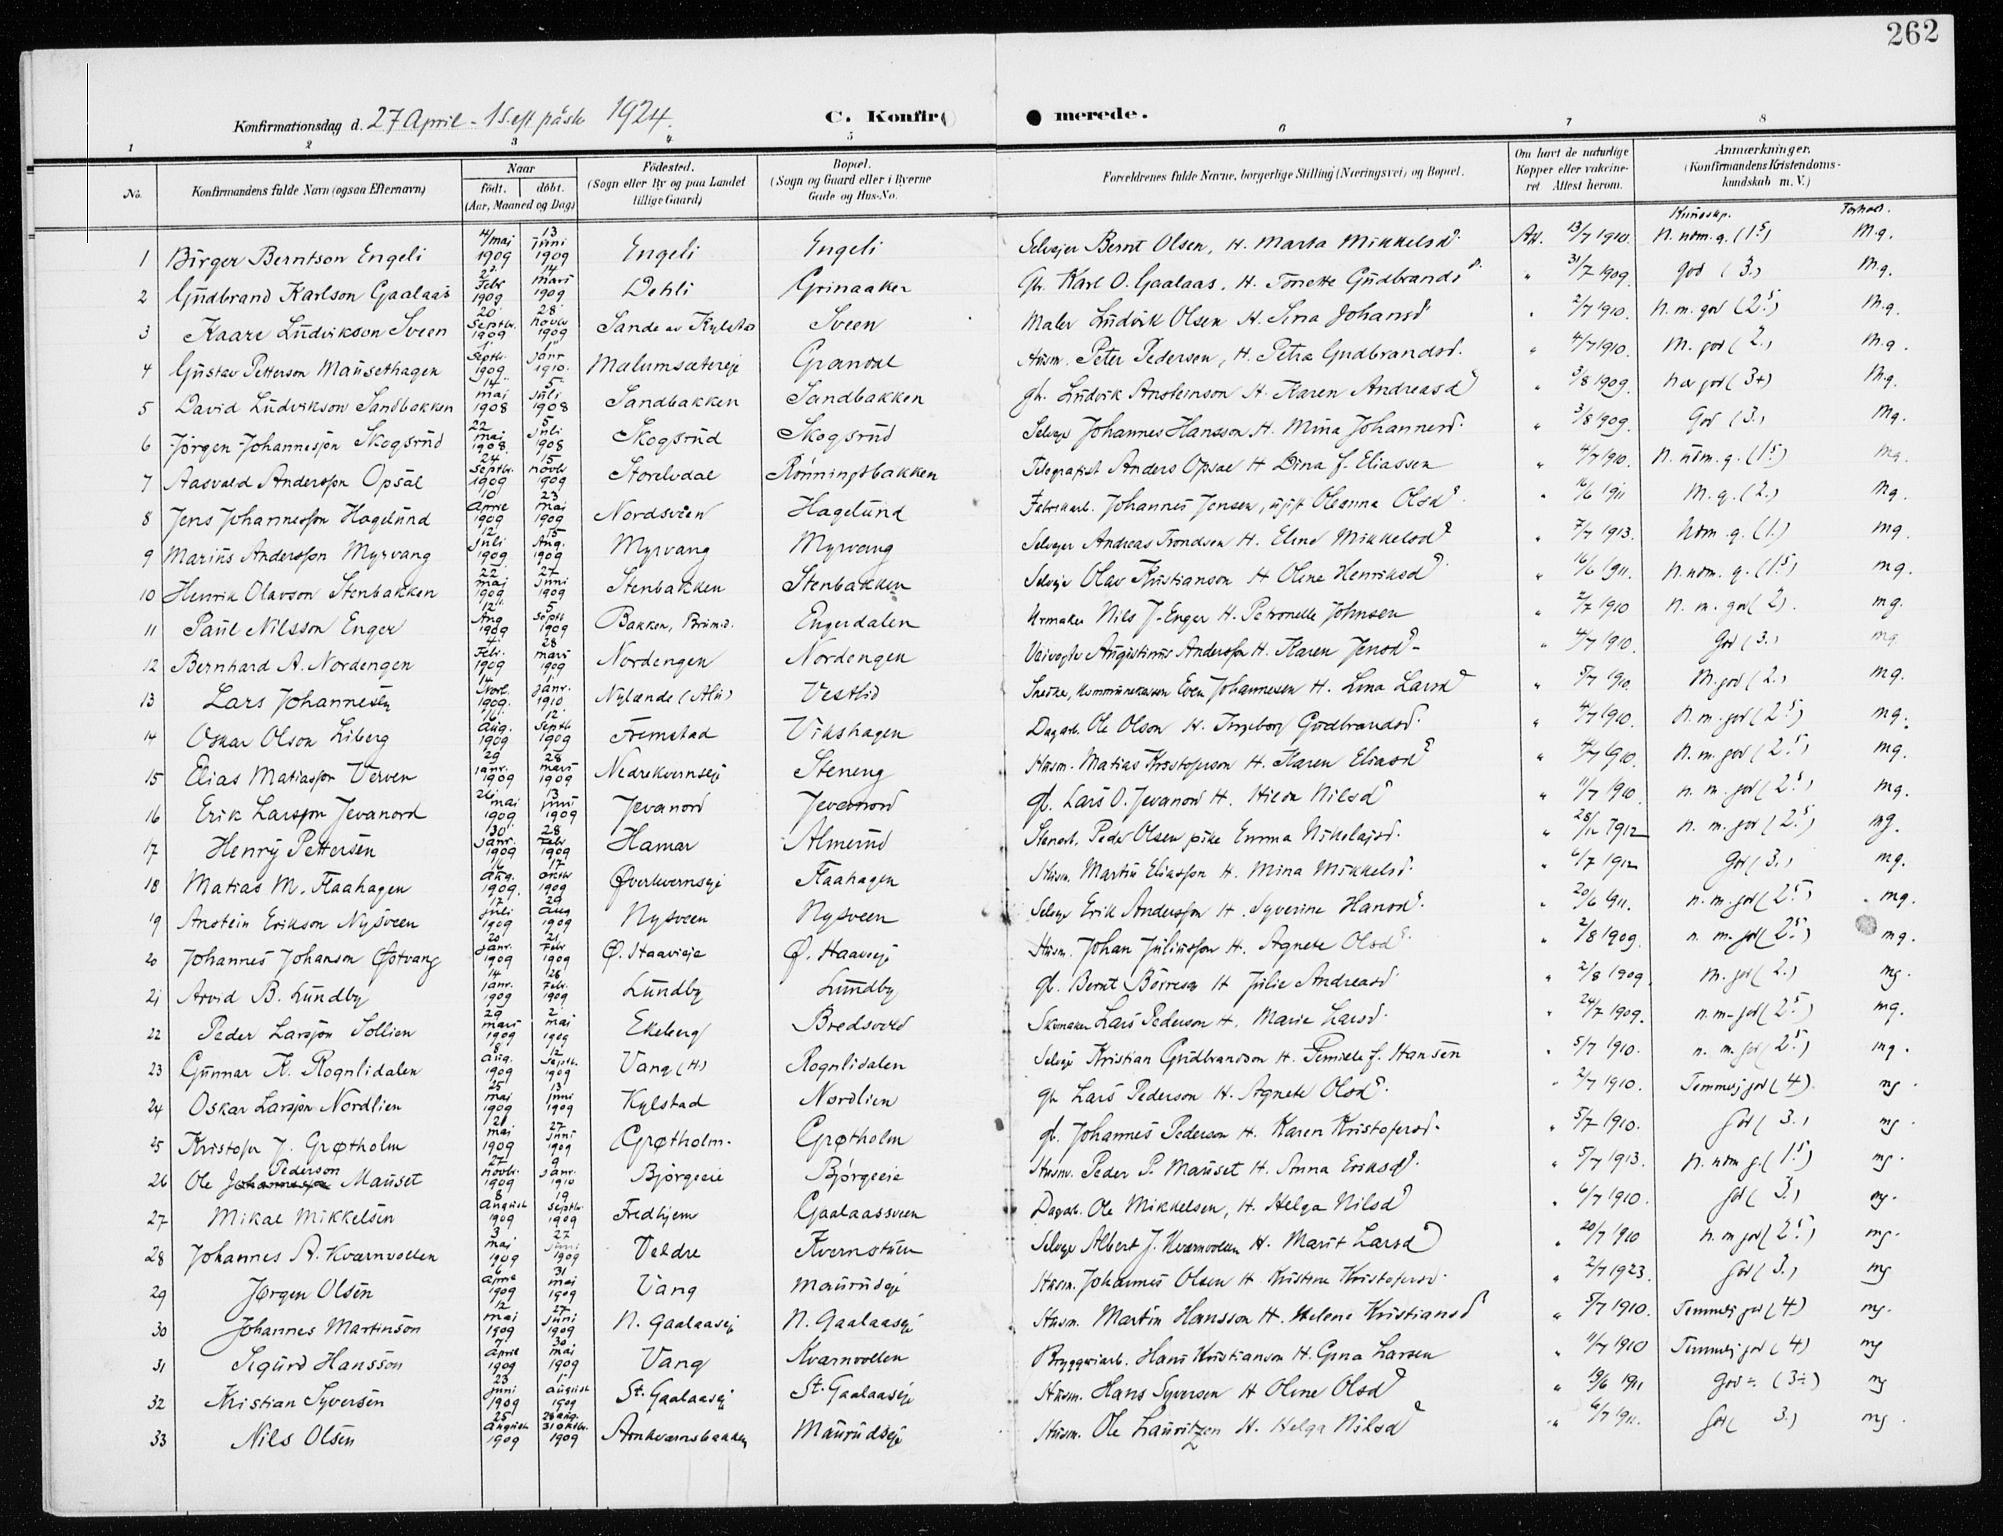 SAH, Furnes prestekontor, K/Ka/L0001: Ministerialbok nr. 1, 1907-1935, s. 262